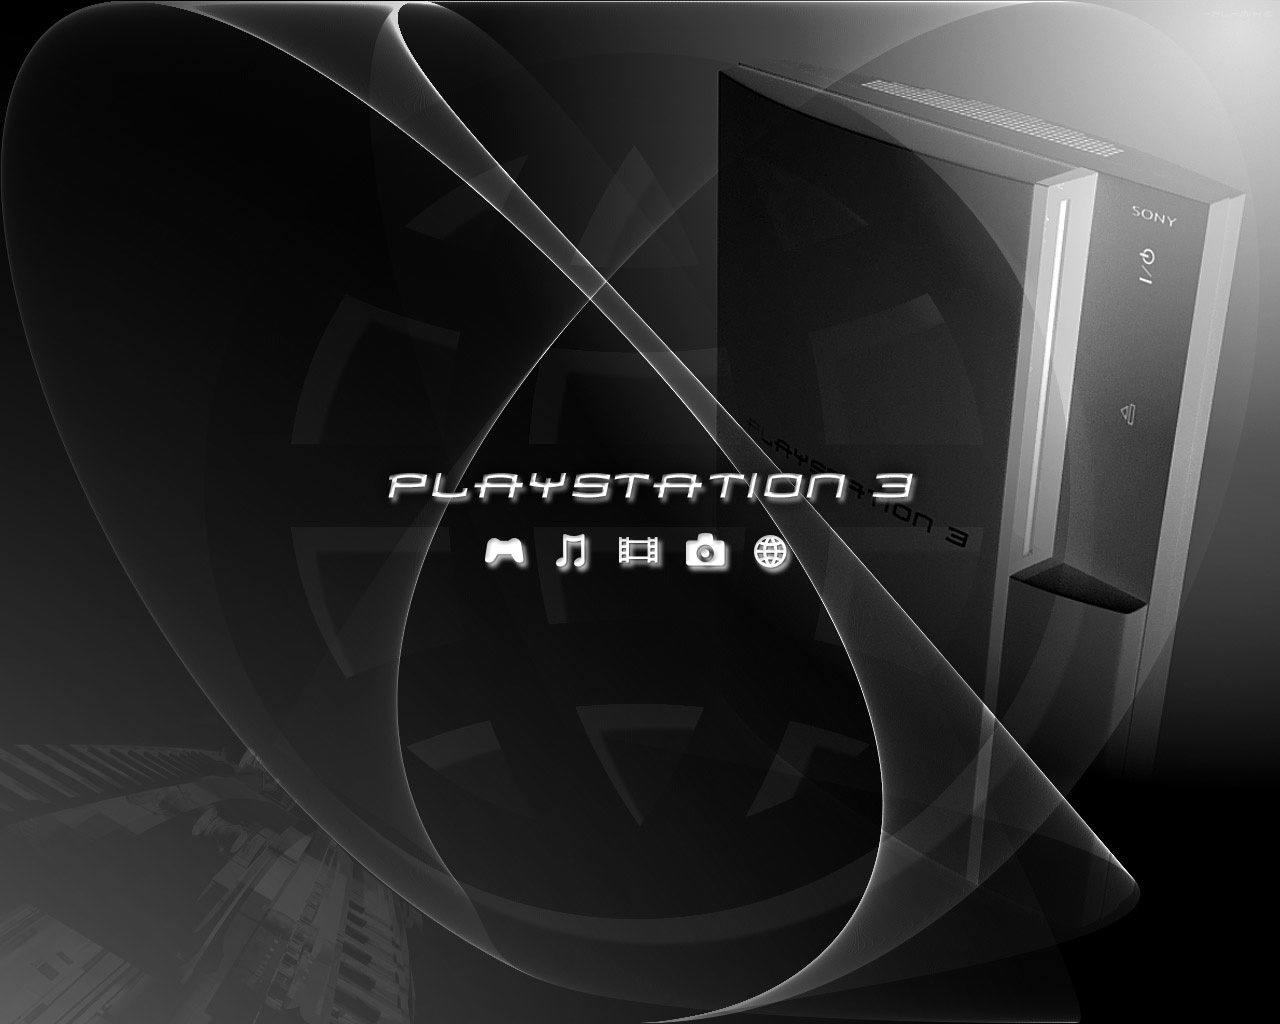 1280x1024 Playstation 3 wallpaper